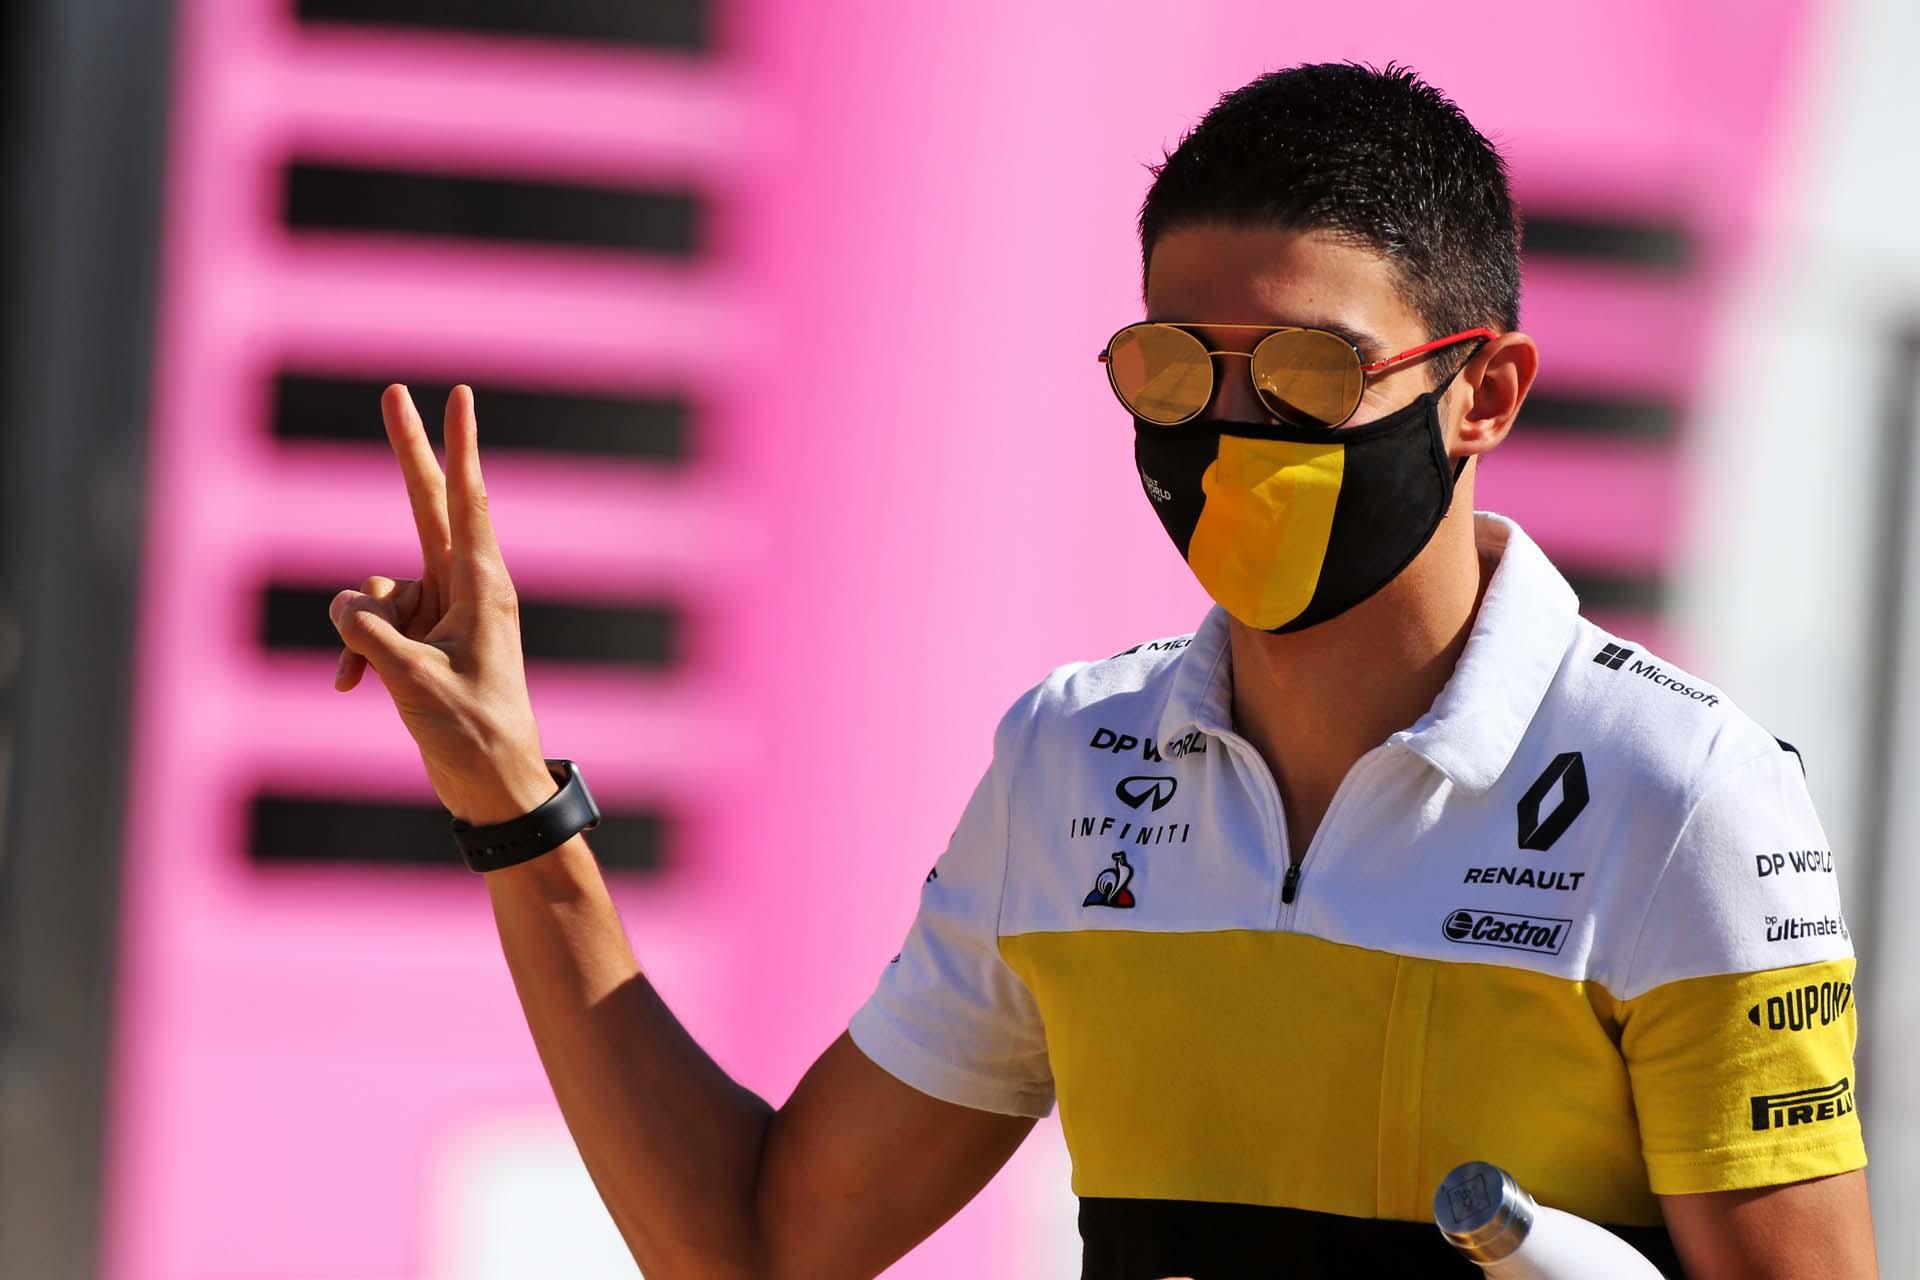 Motor Racing - Formula One World Championship - British Grand Prix - Practice Day - Silverstone, England